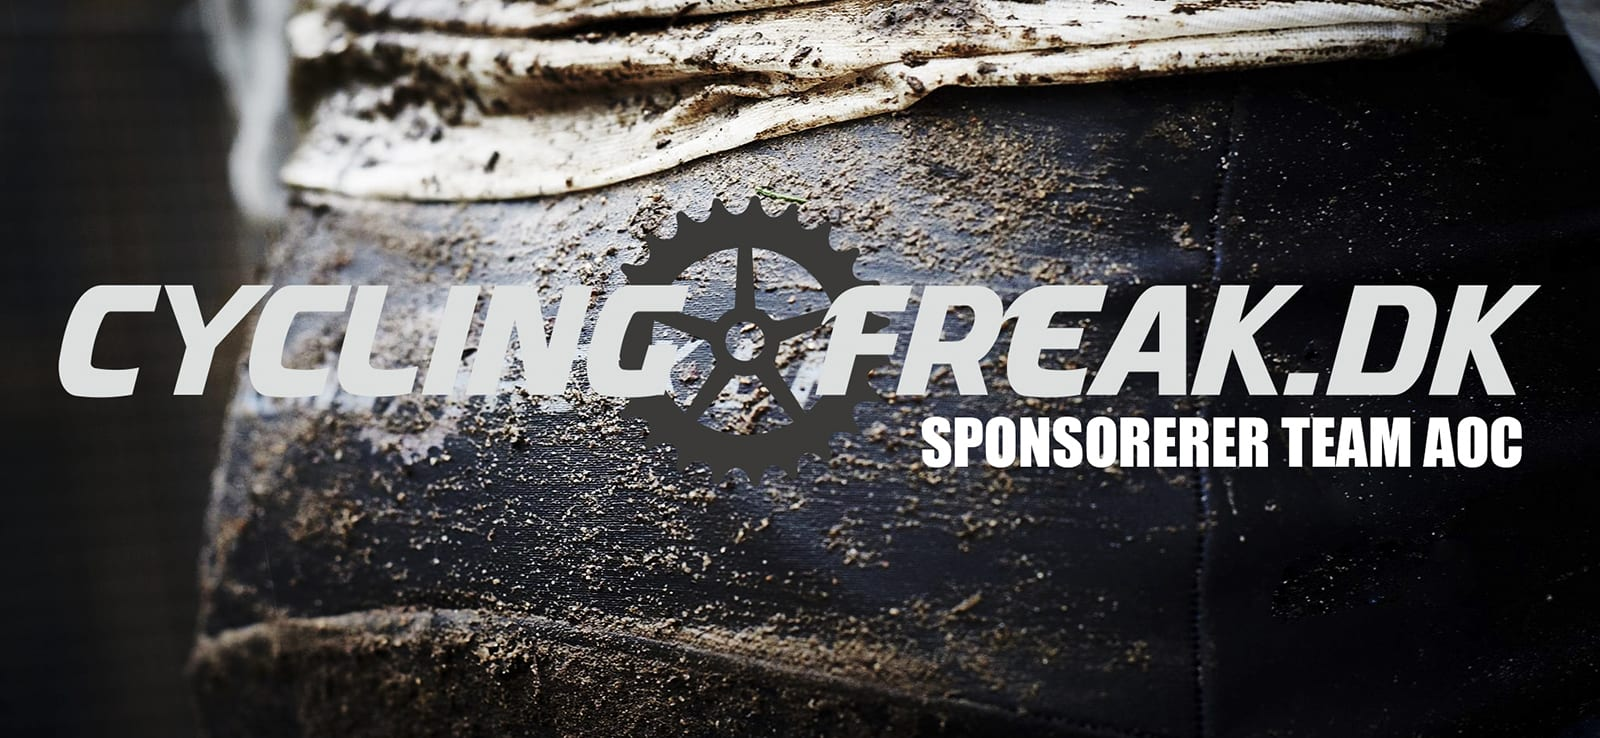 CyclingFreak sponsorerer Team AoC i 2015 // Altomcykling.dk